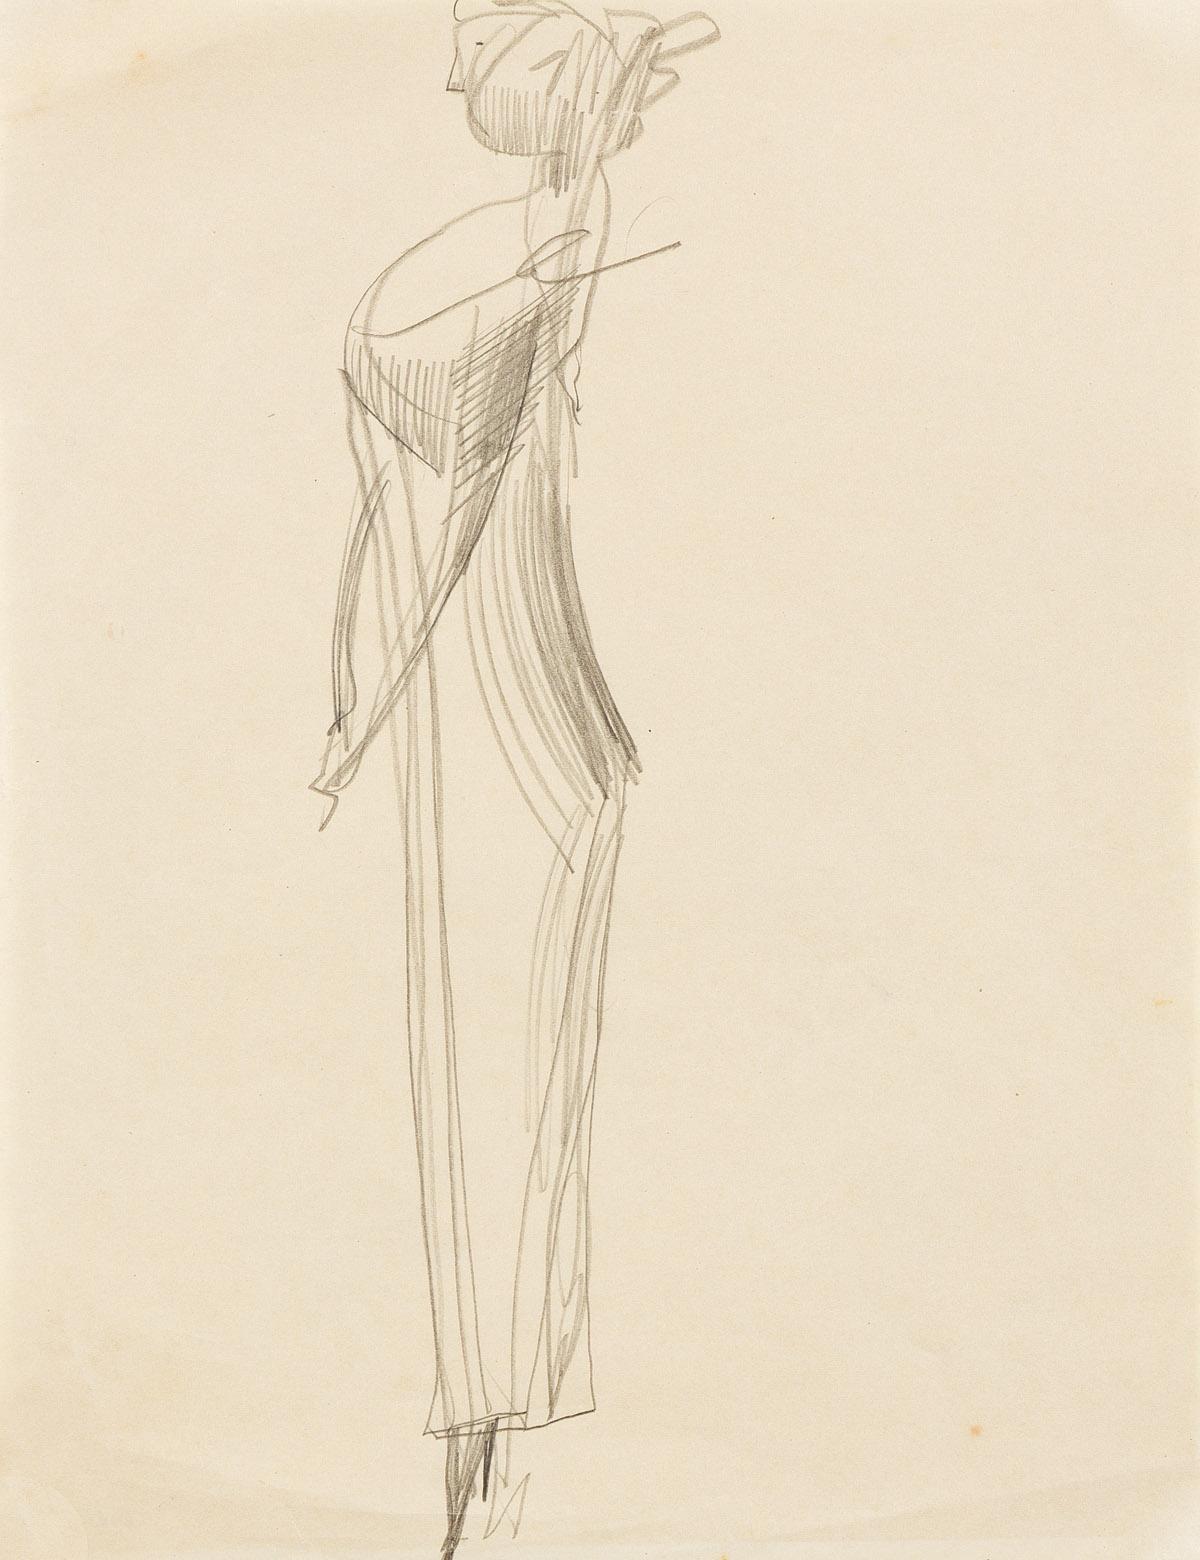 ELIE NADELMAN (1882-1946) Standing Woman in Profile.